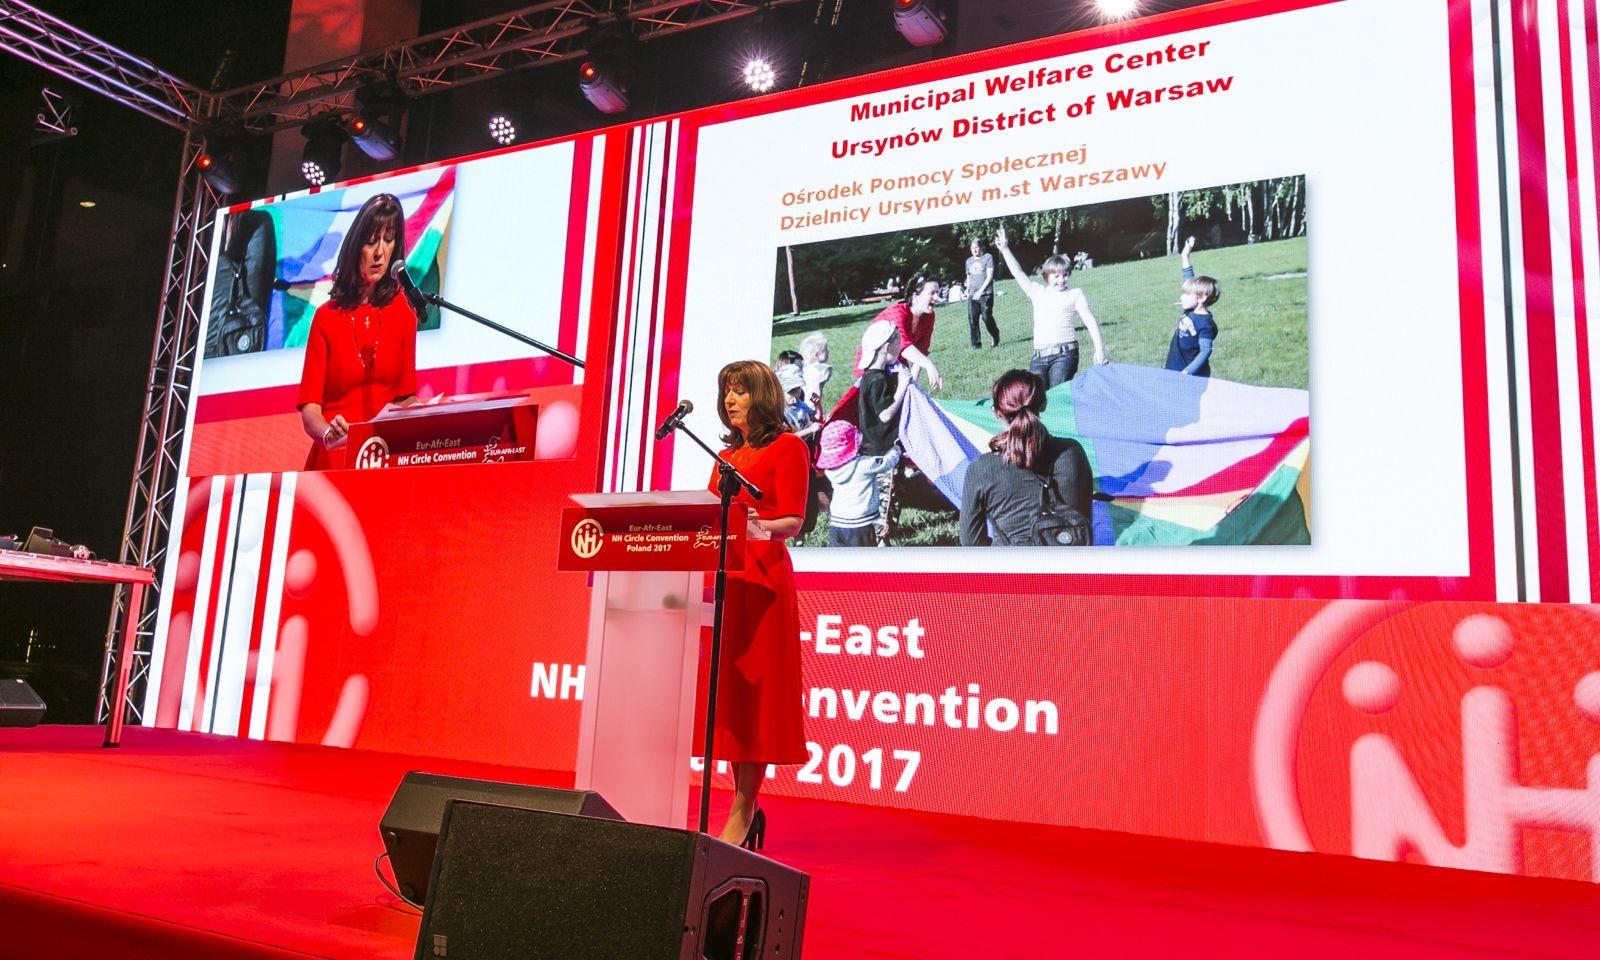 EUR-AFR-EST New Honda Circle Convention Warsaw 2017 | oneAVteam